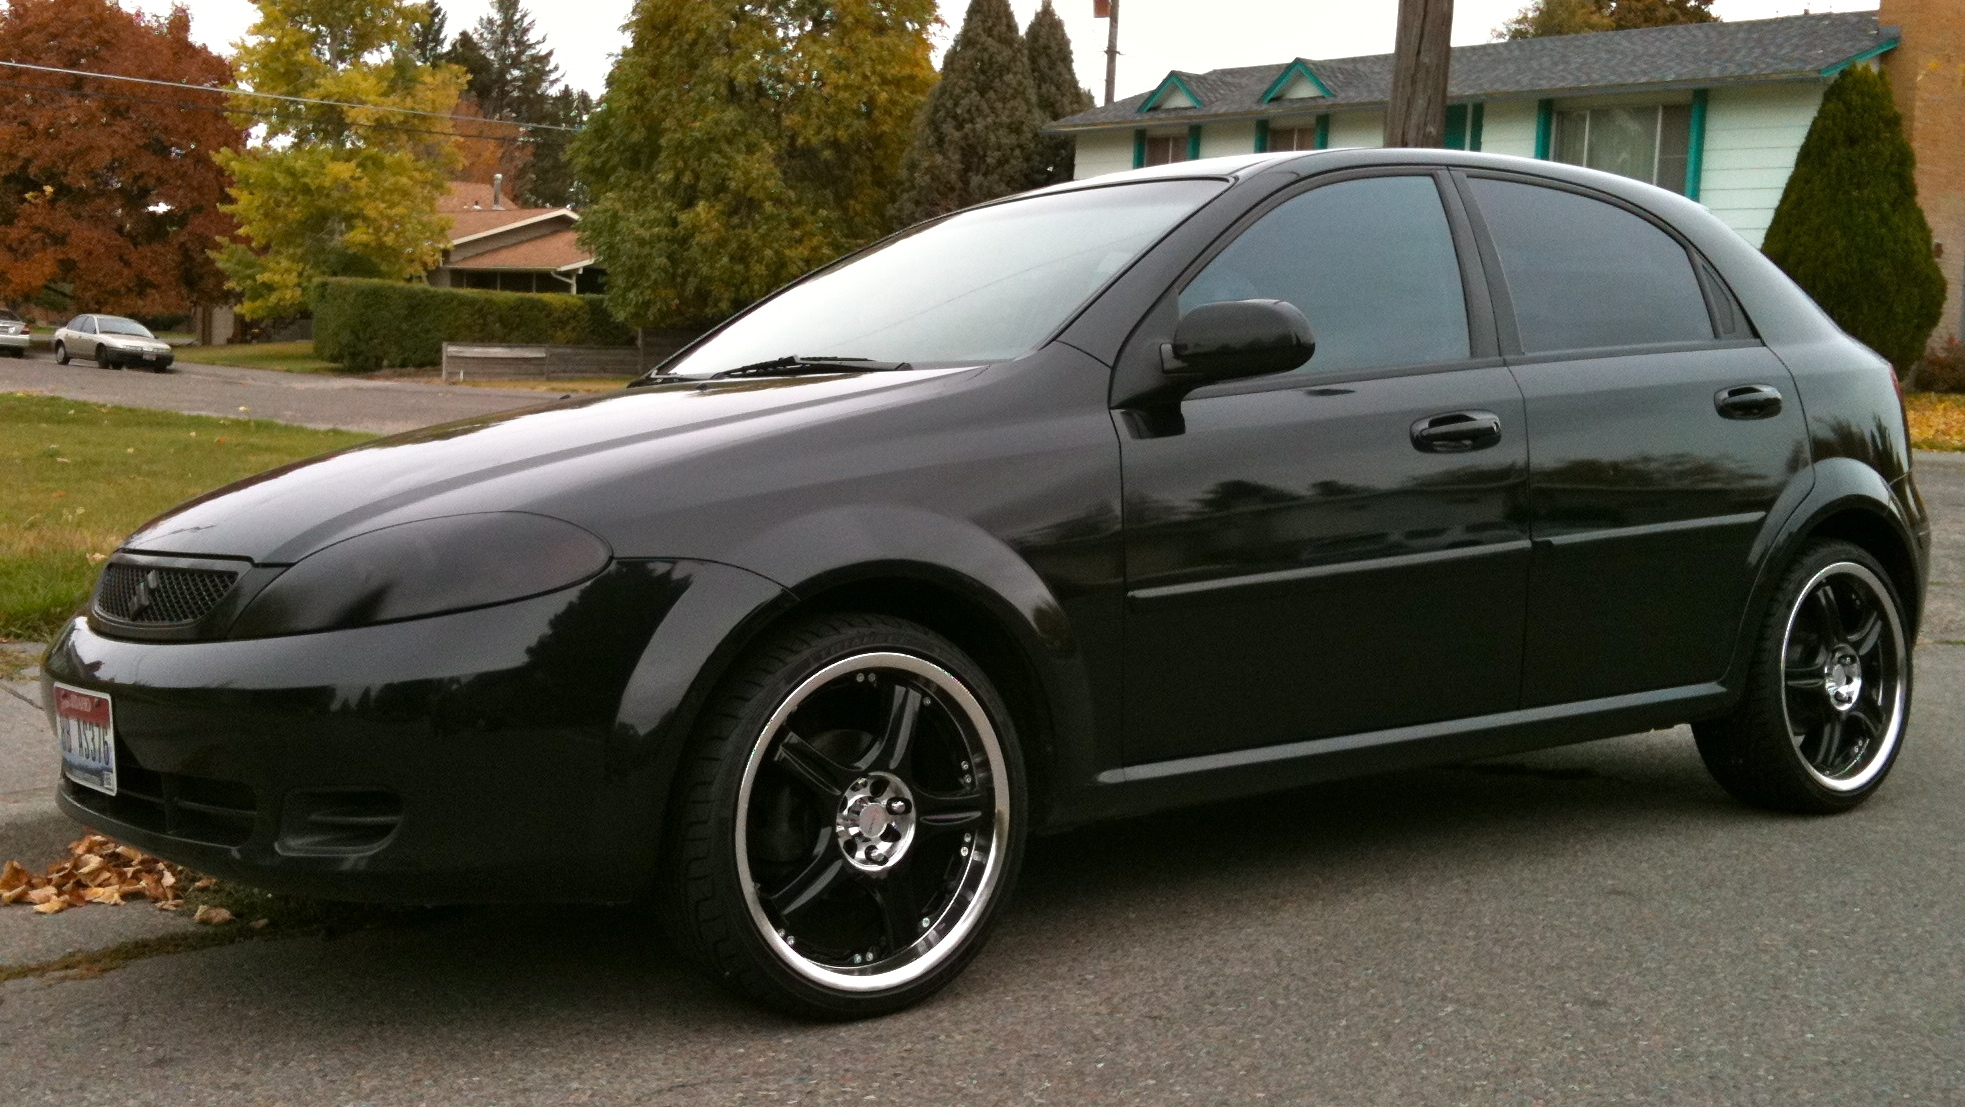 Suzuki Reno Black